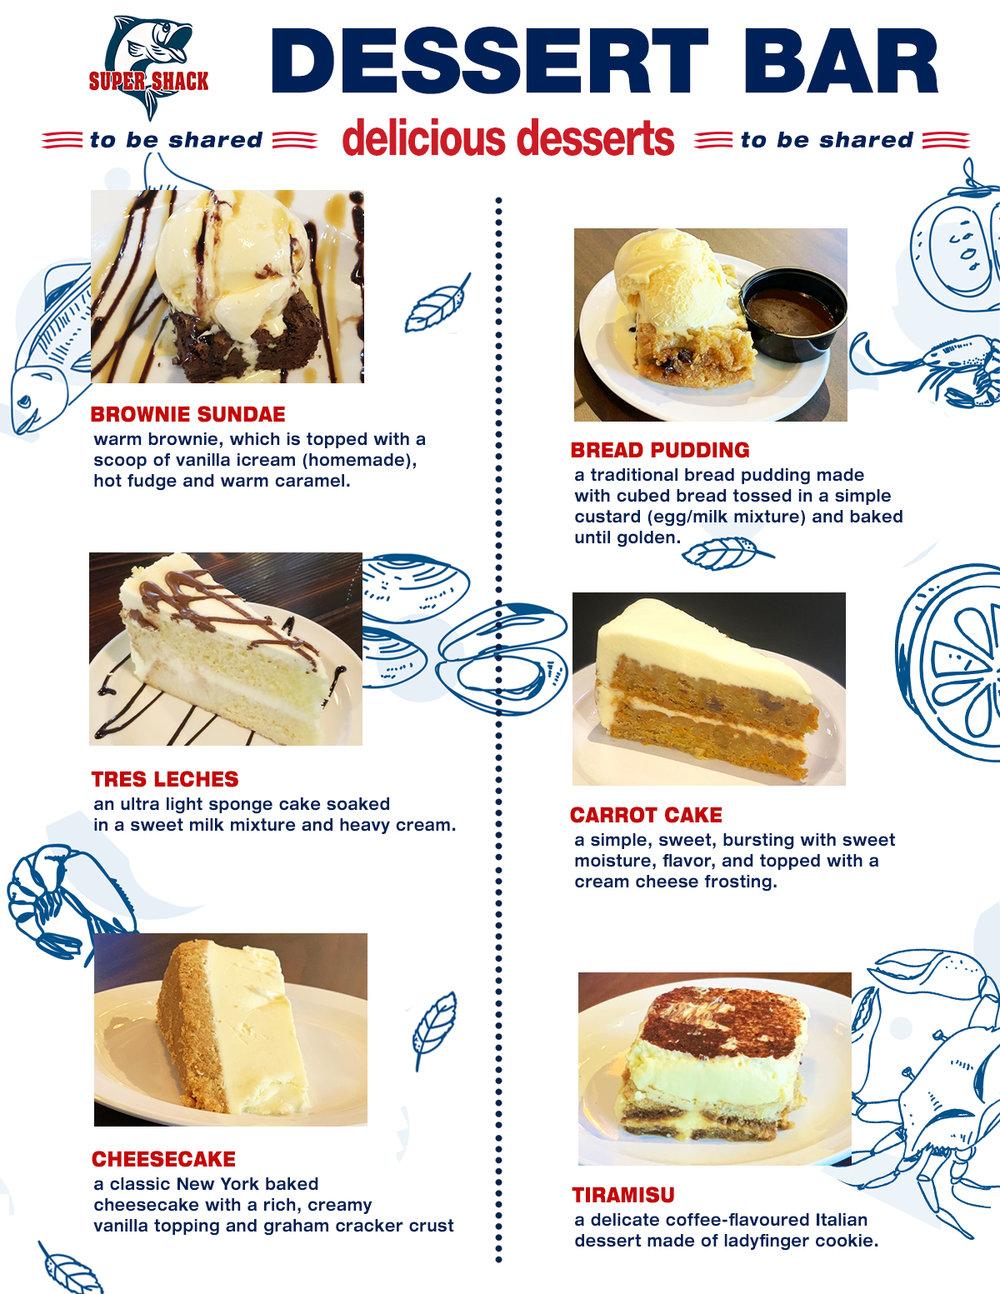 dessert-menu-supershack.jpg